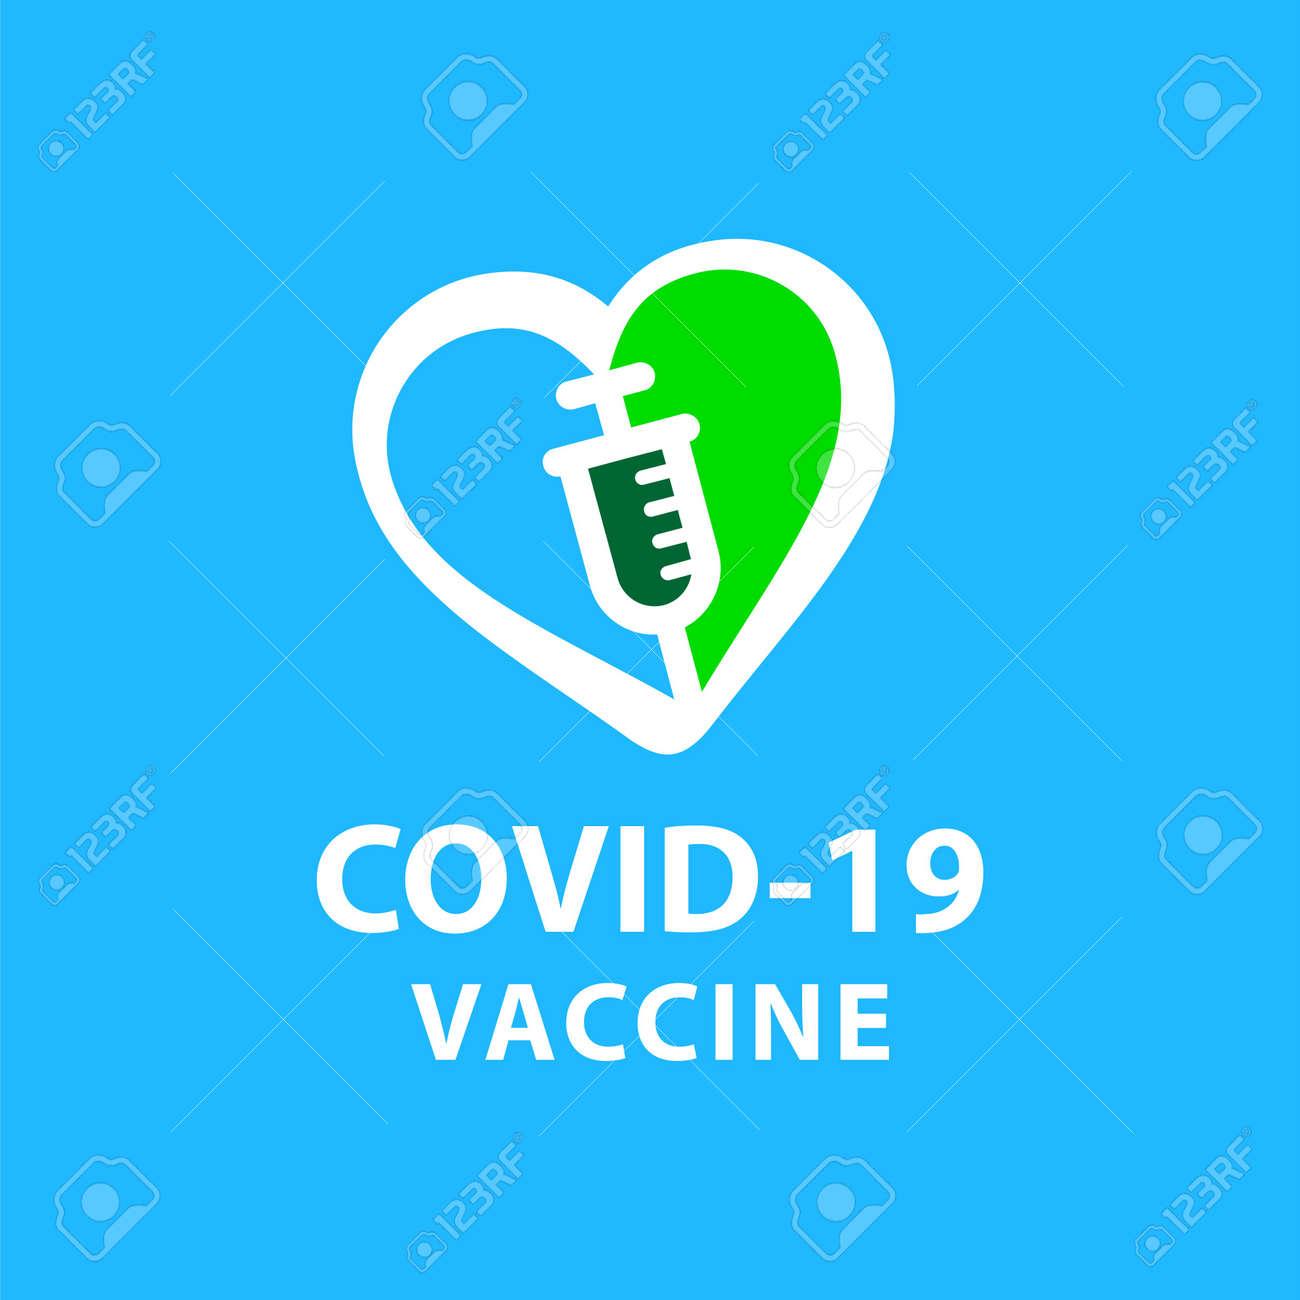 i got my covid-19 vaccine!, vaccine lover concept - 167256304